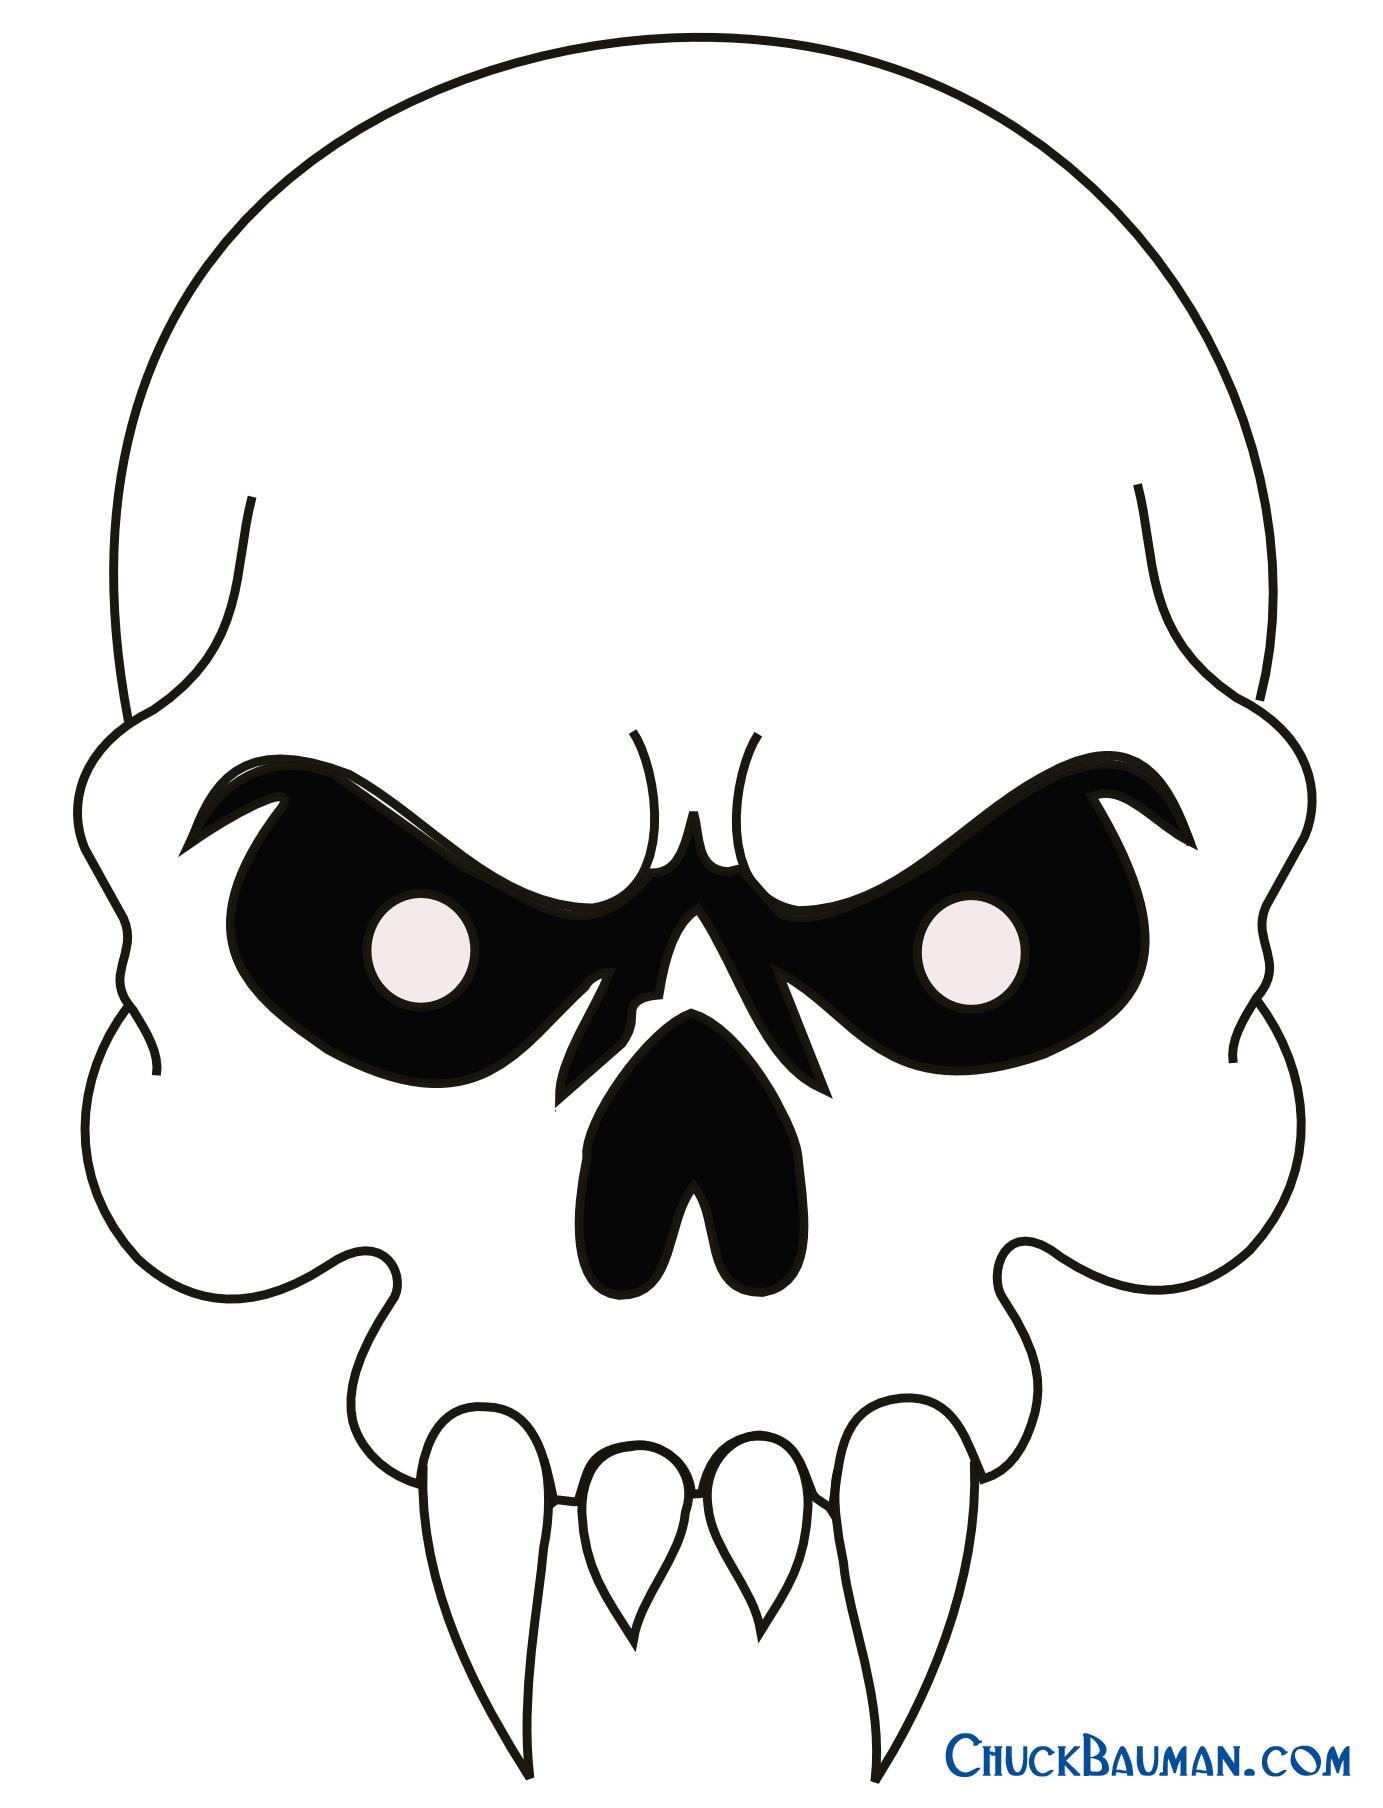 1383x1808 Skull Drawings Easy Really Easy Skull Drawings Skulls Airbrushing